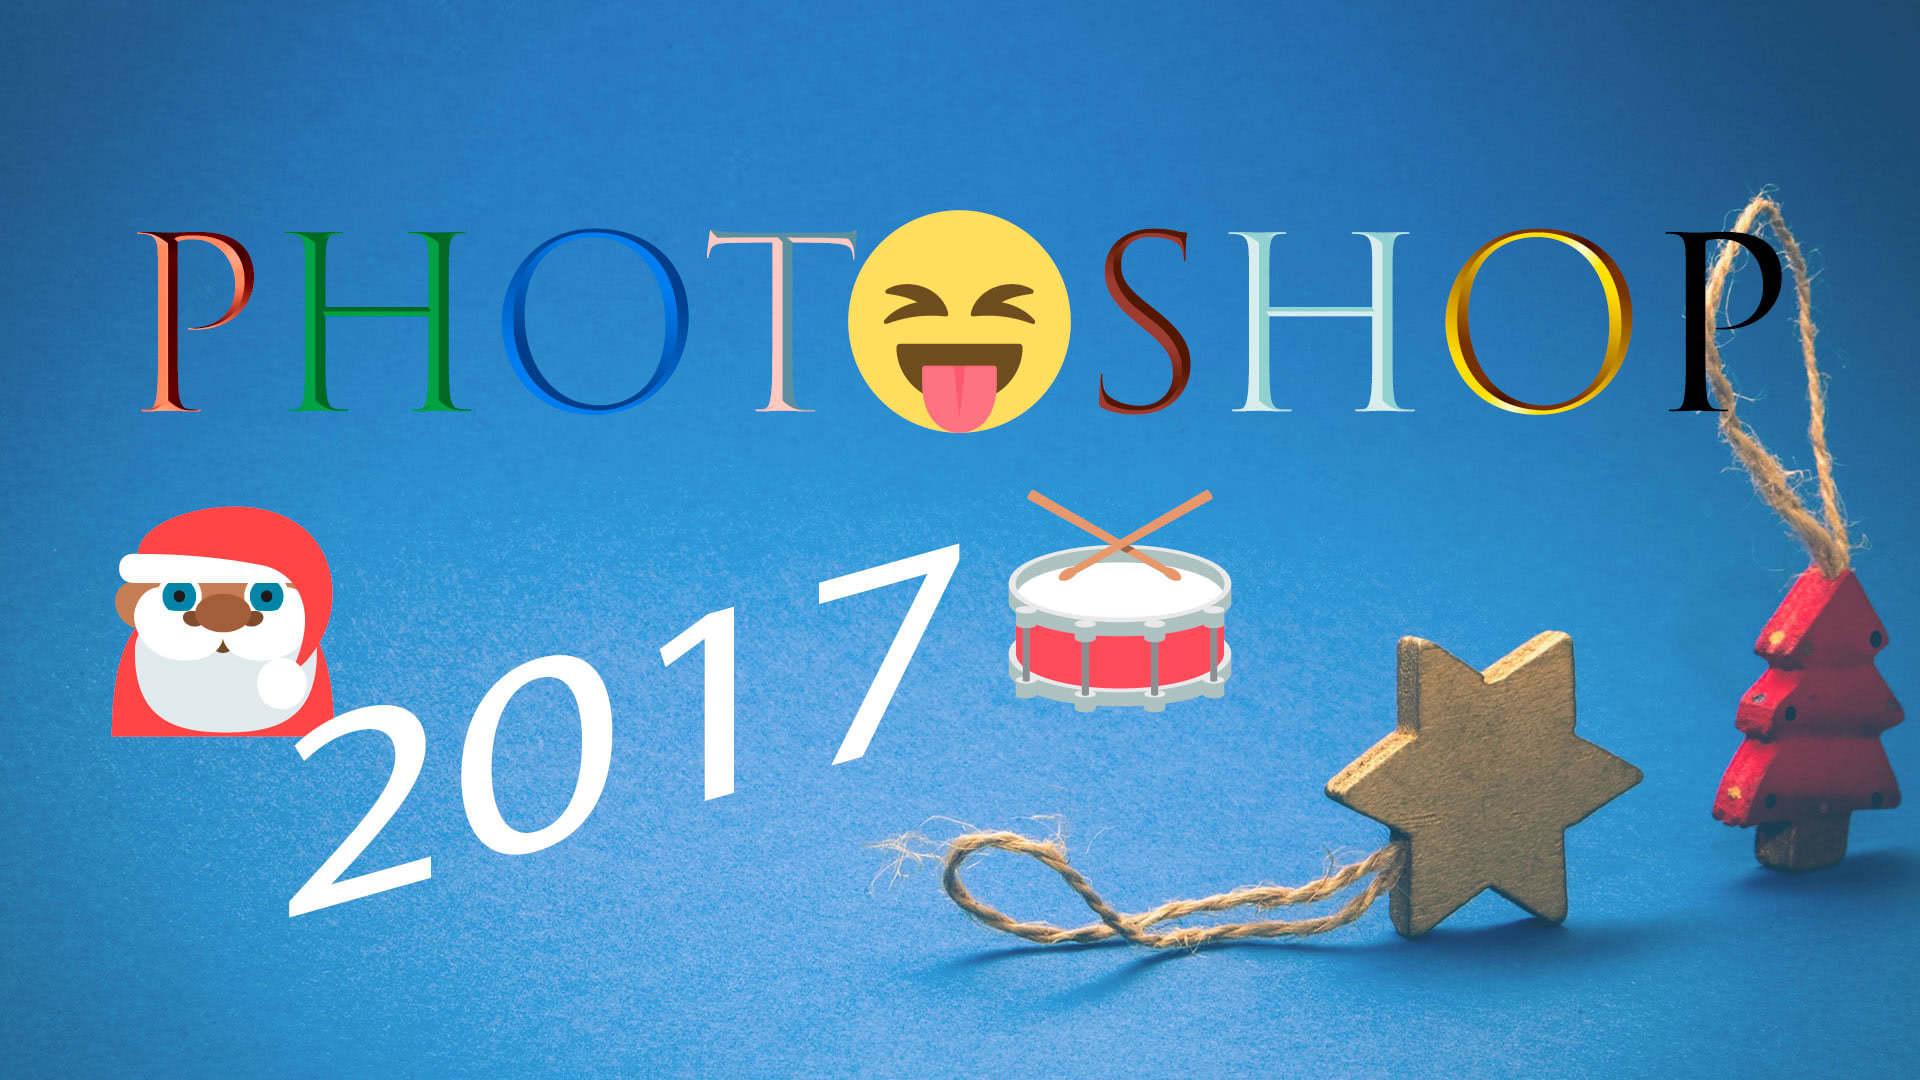 Photoshop em 2017